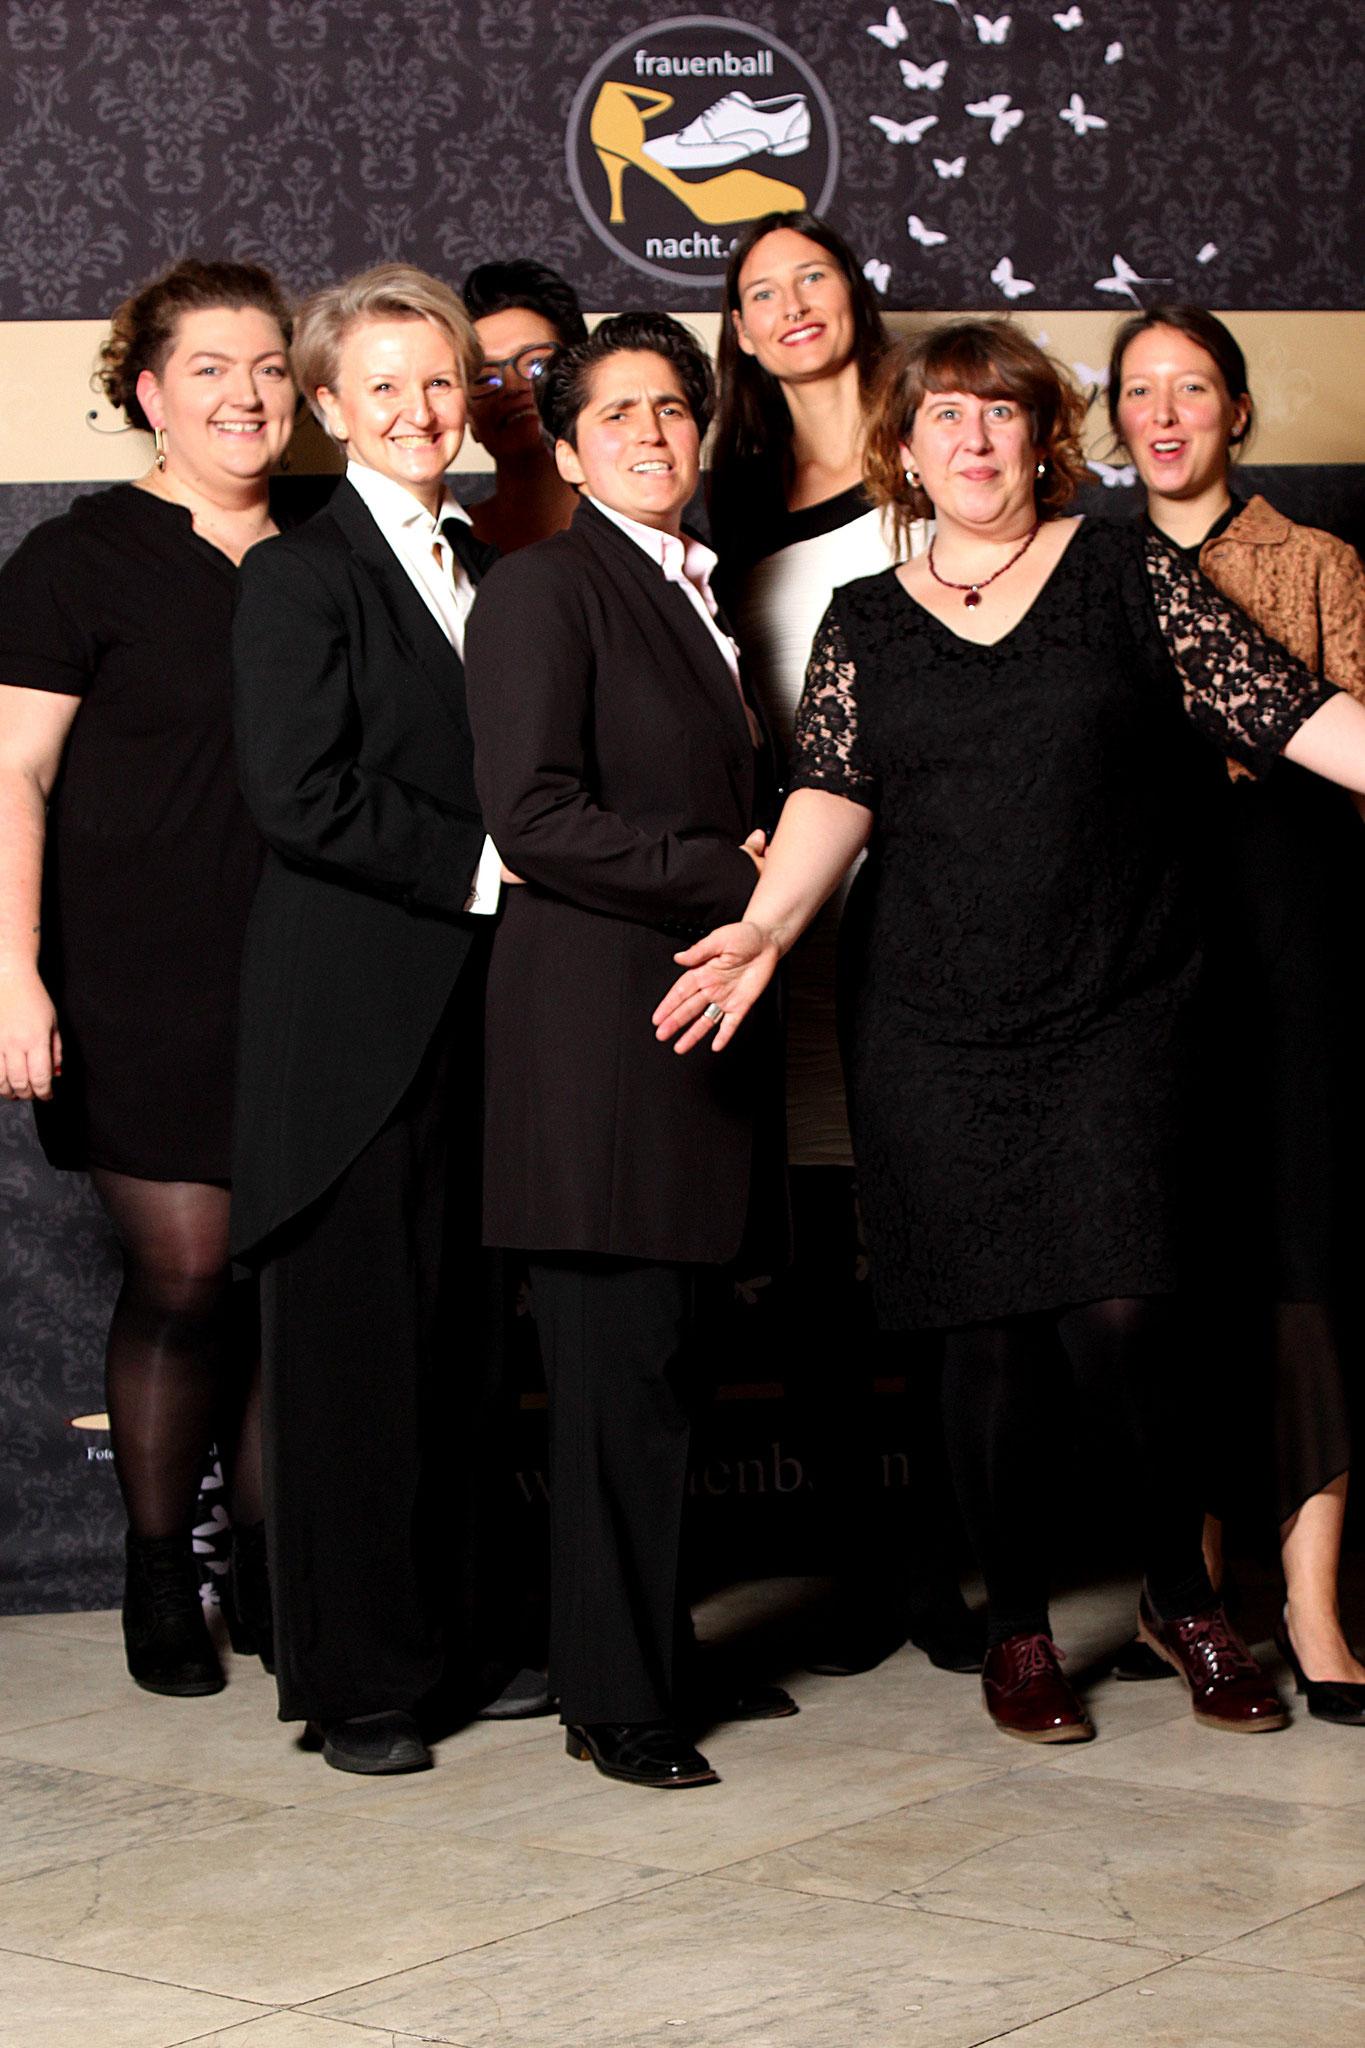 Das Team der FBN  (pic by Oxana Kessler)